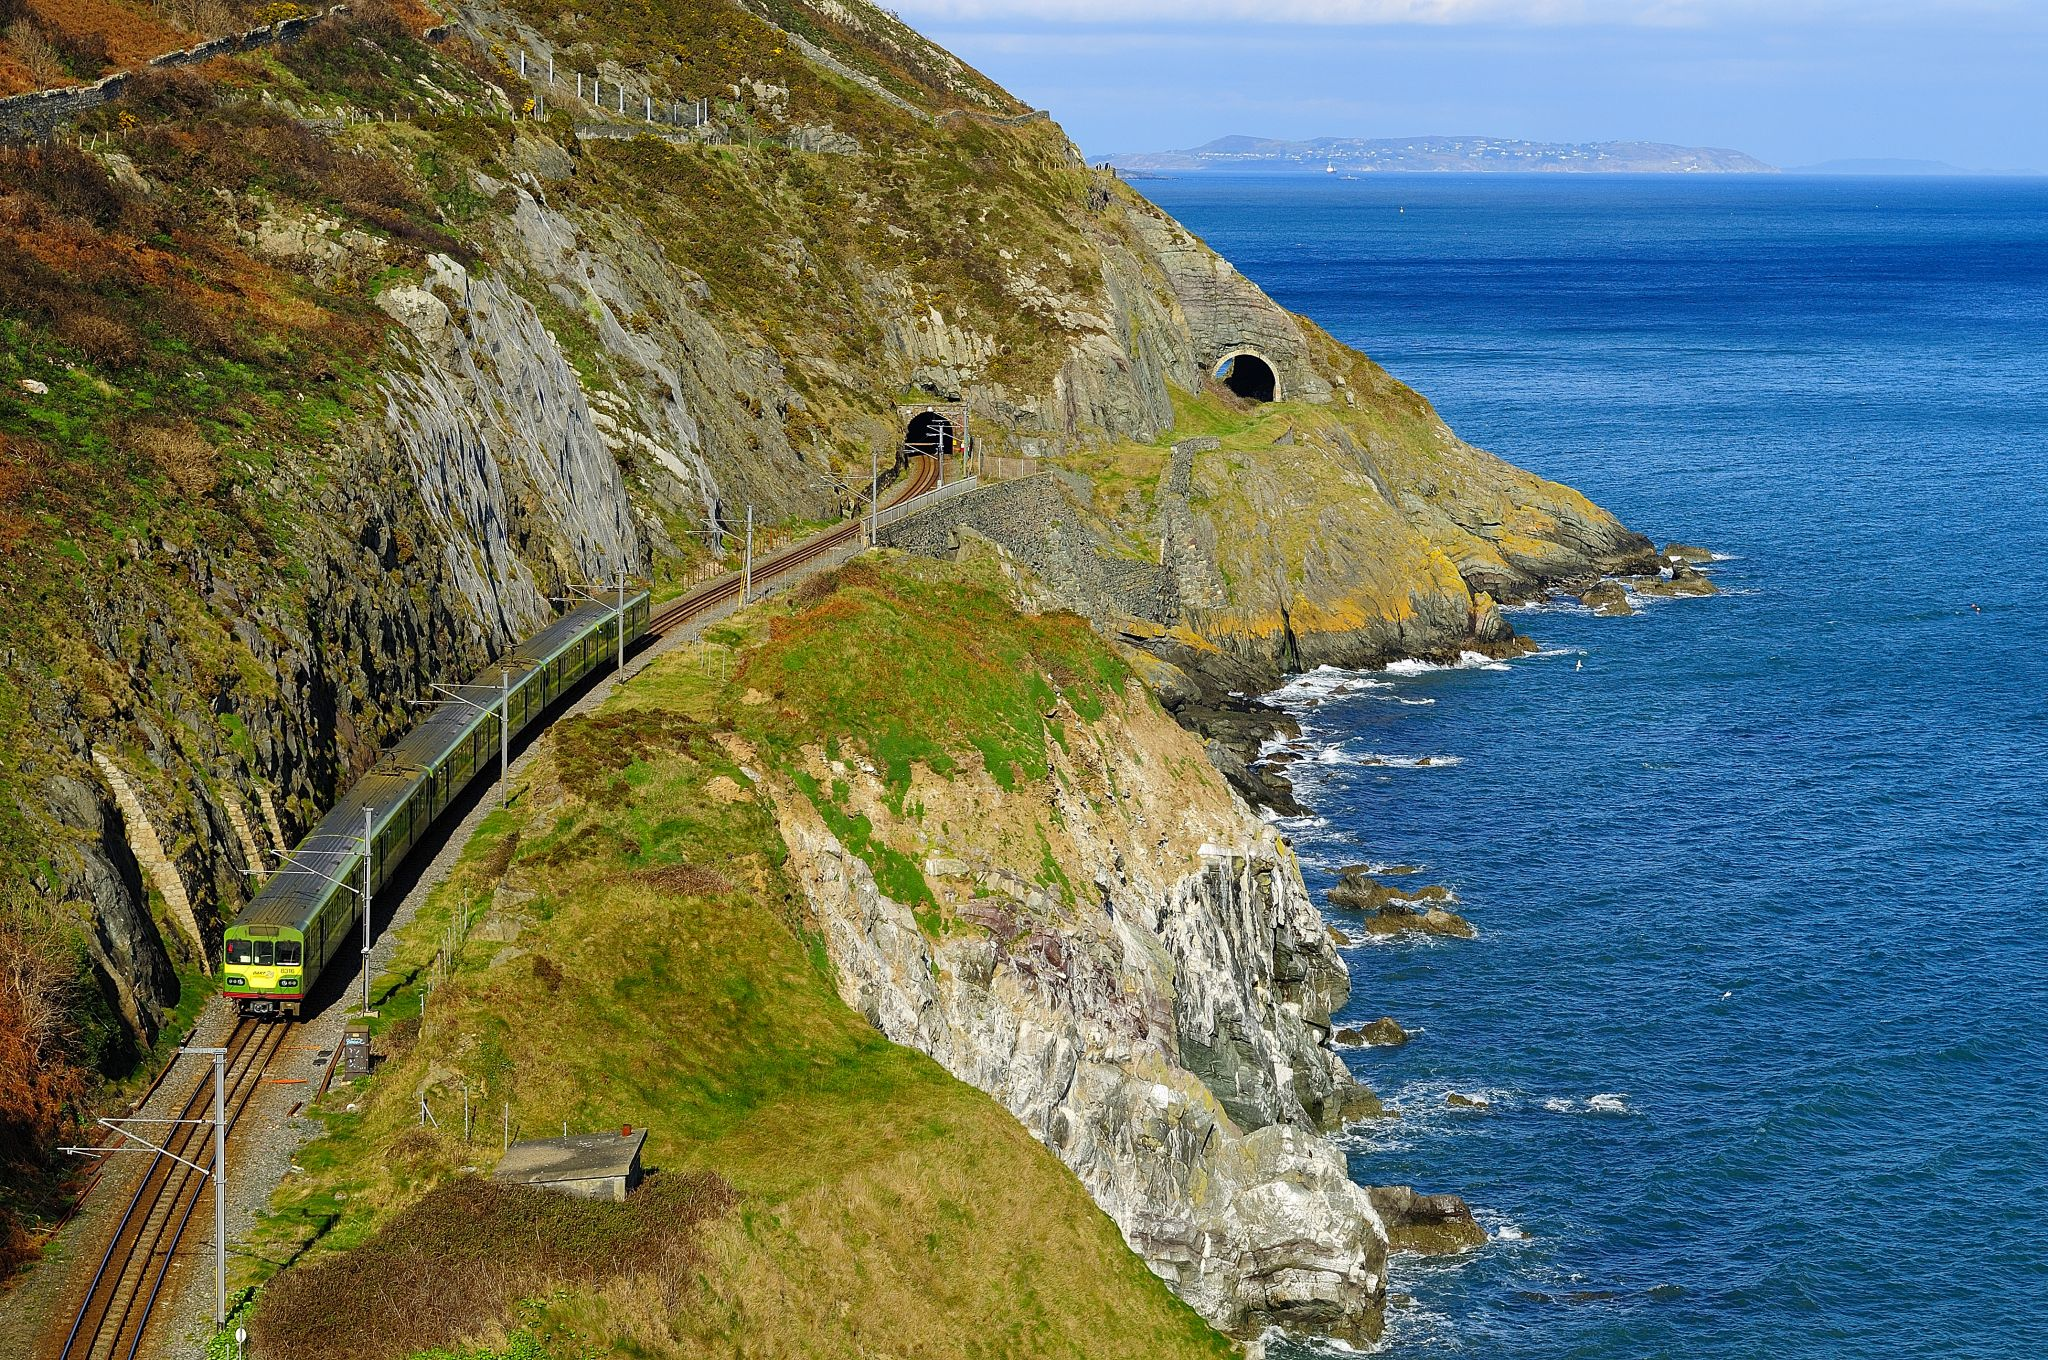 Bray Greystones Cliff walk, co Wicklow, Ireland